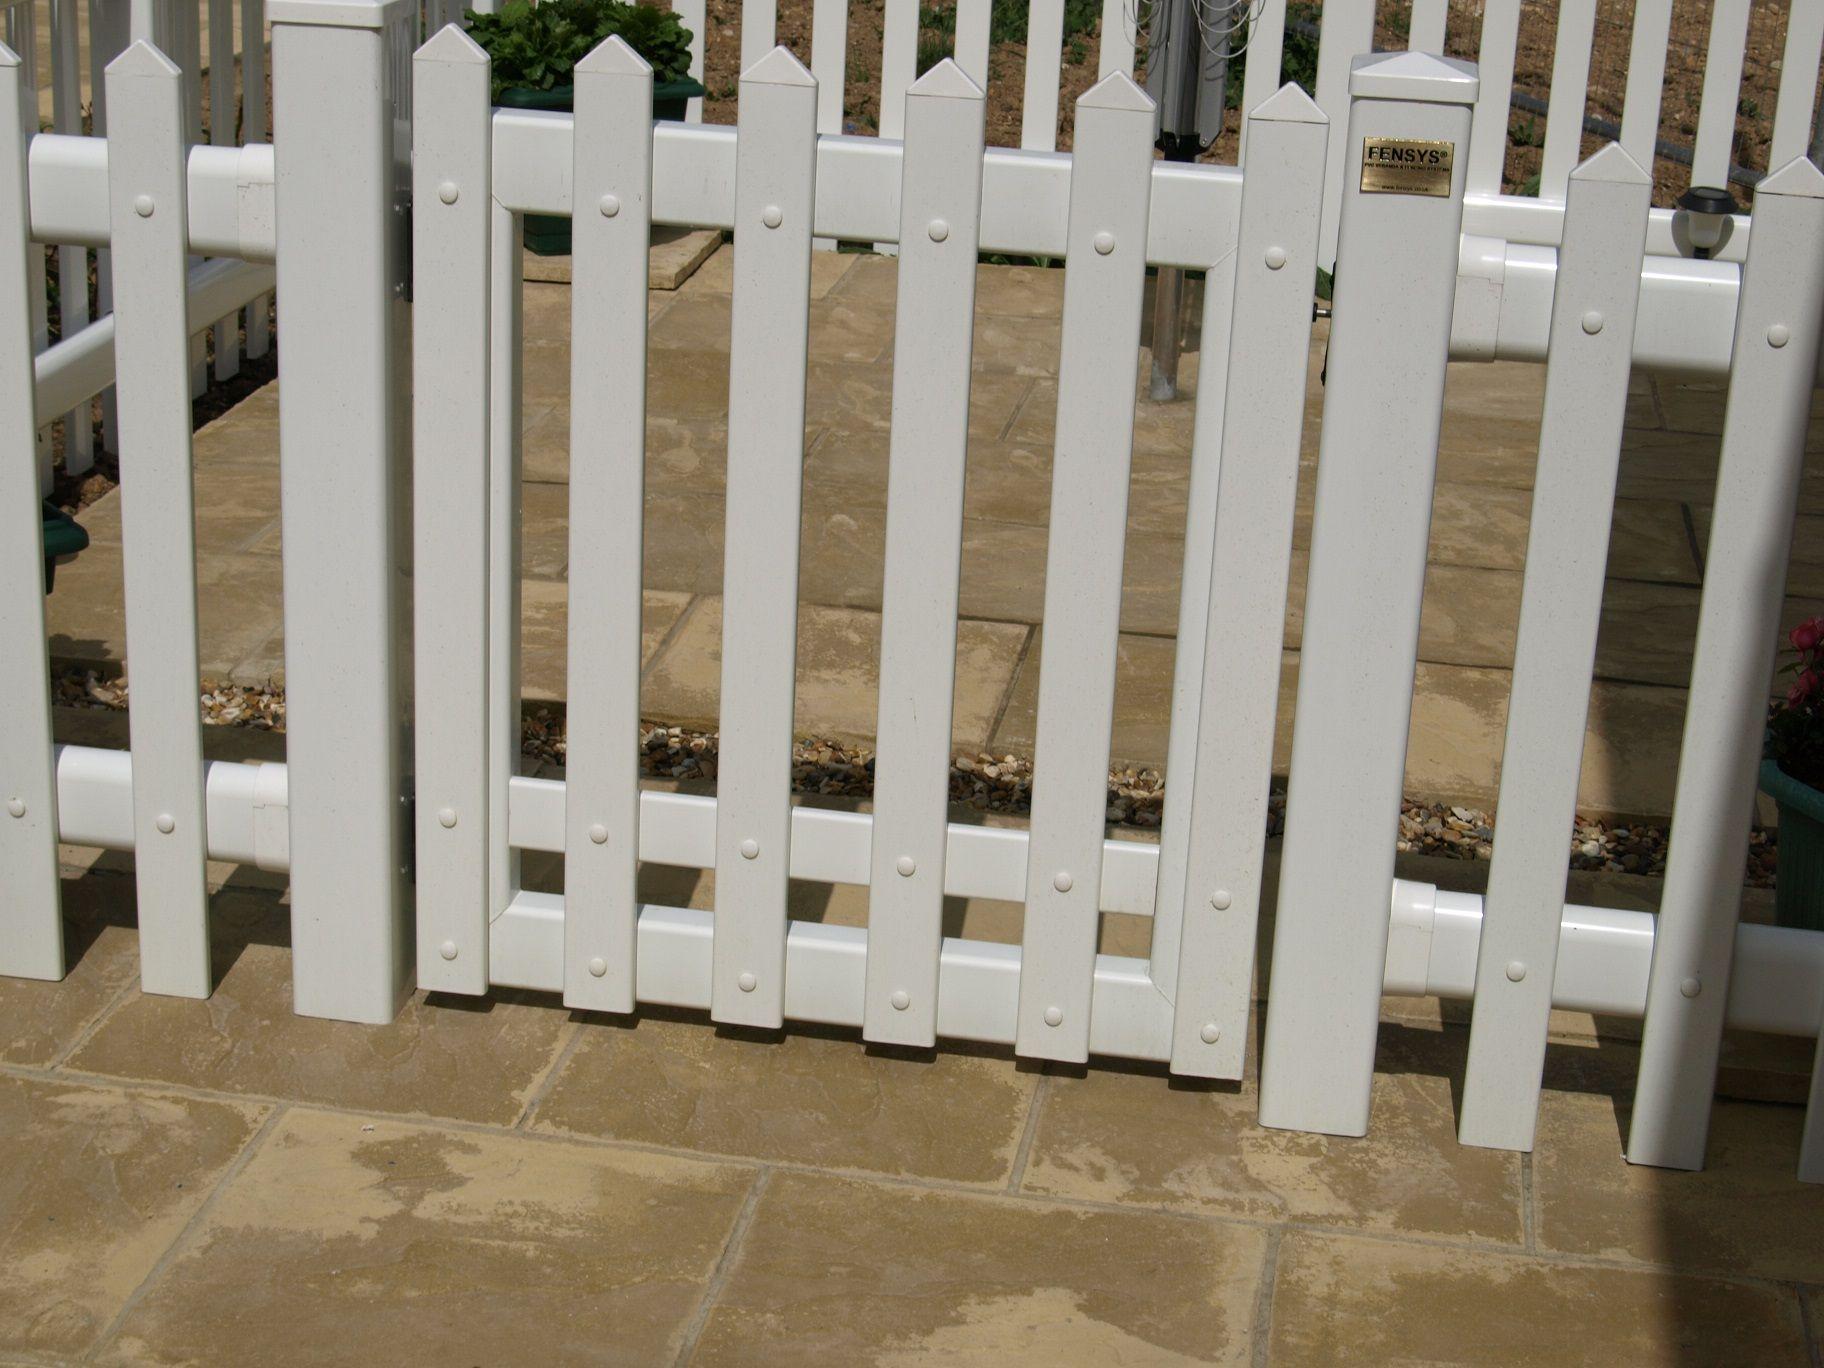 Fensys Upvc White Plastic Picket Fence Gate Decking Fence Easy